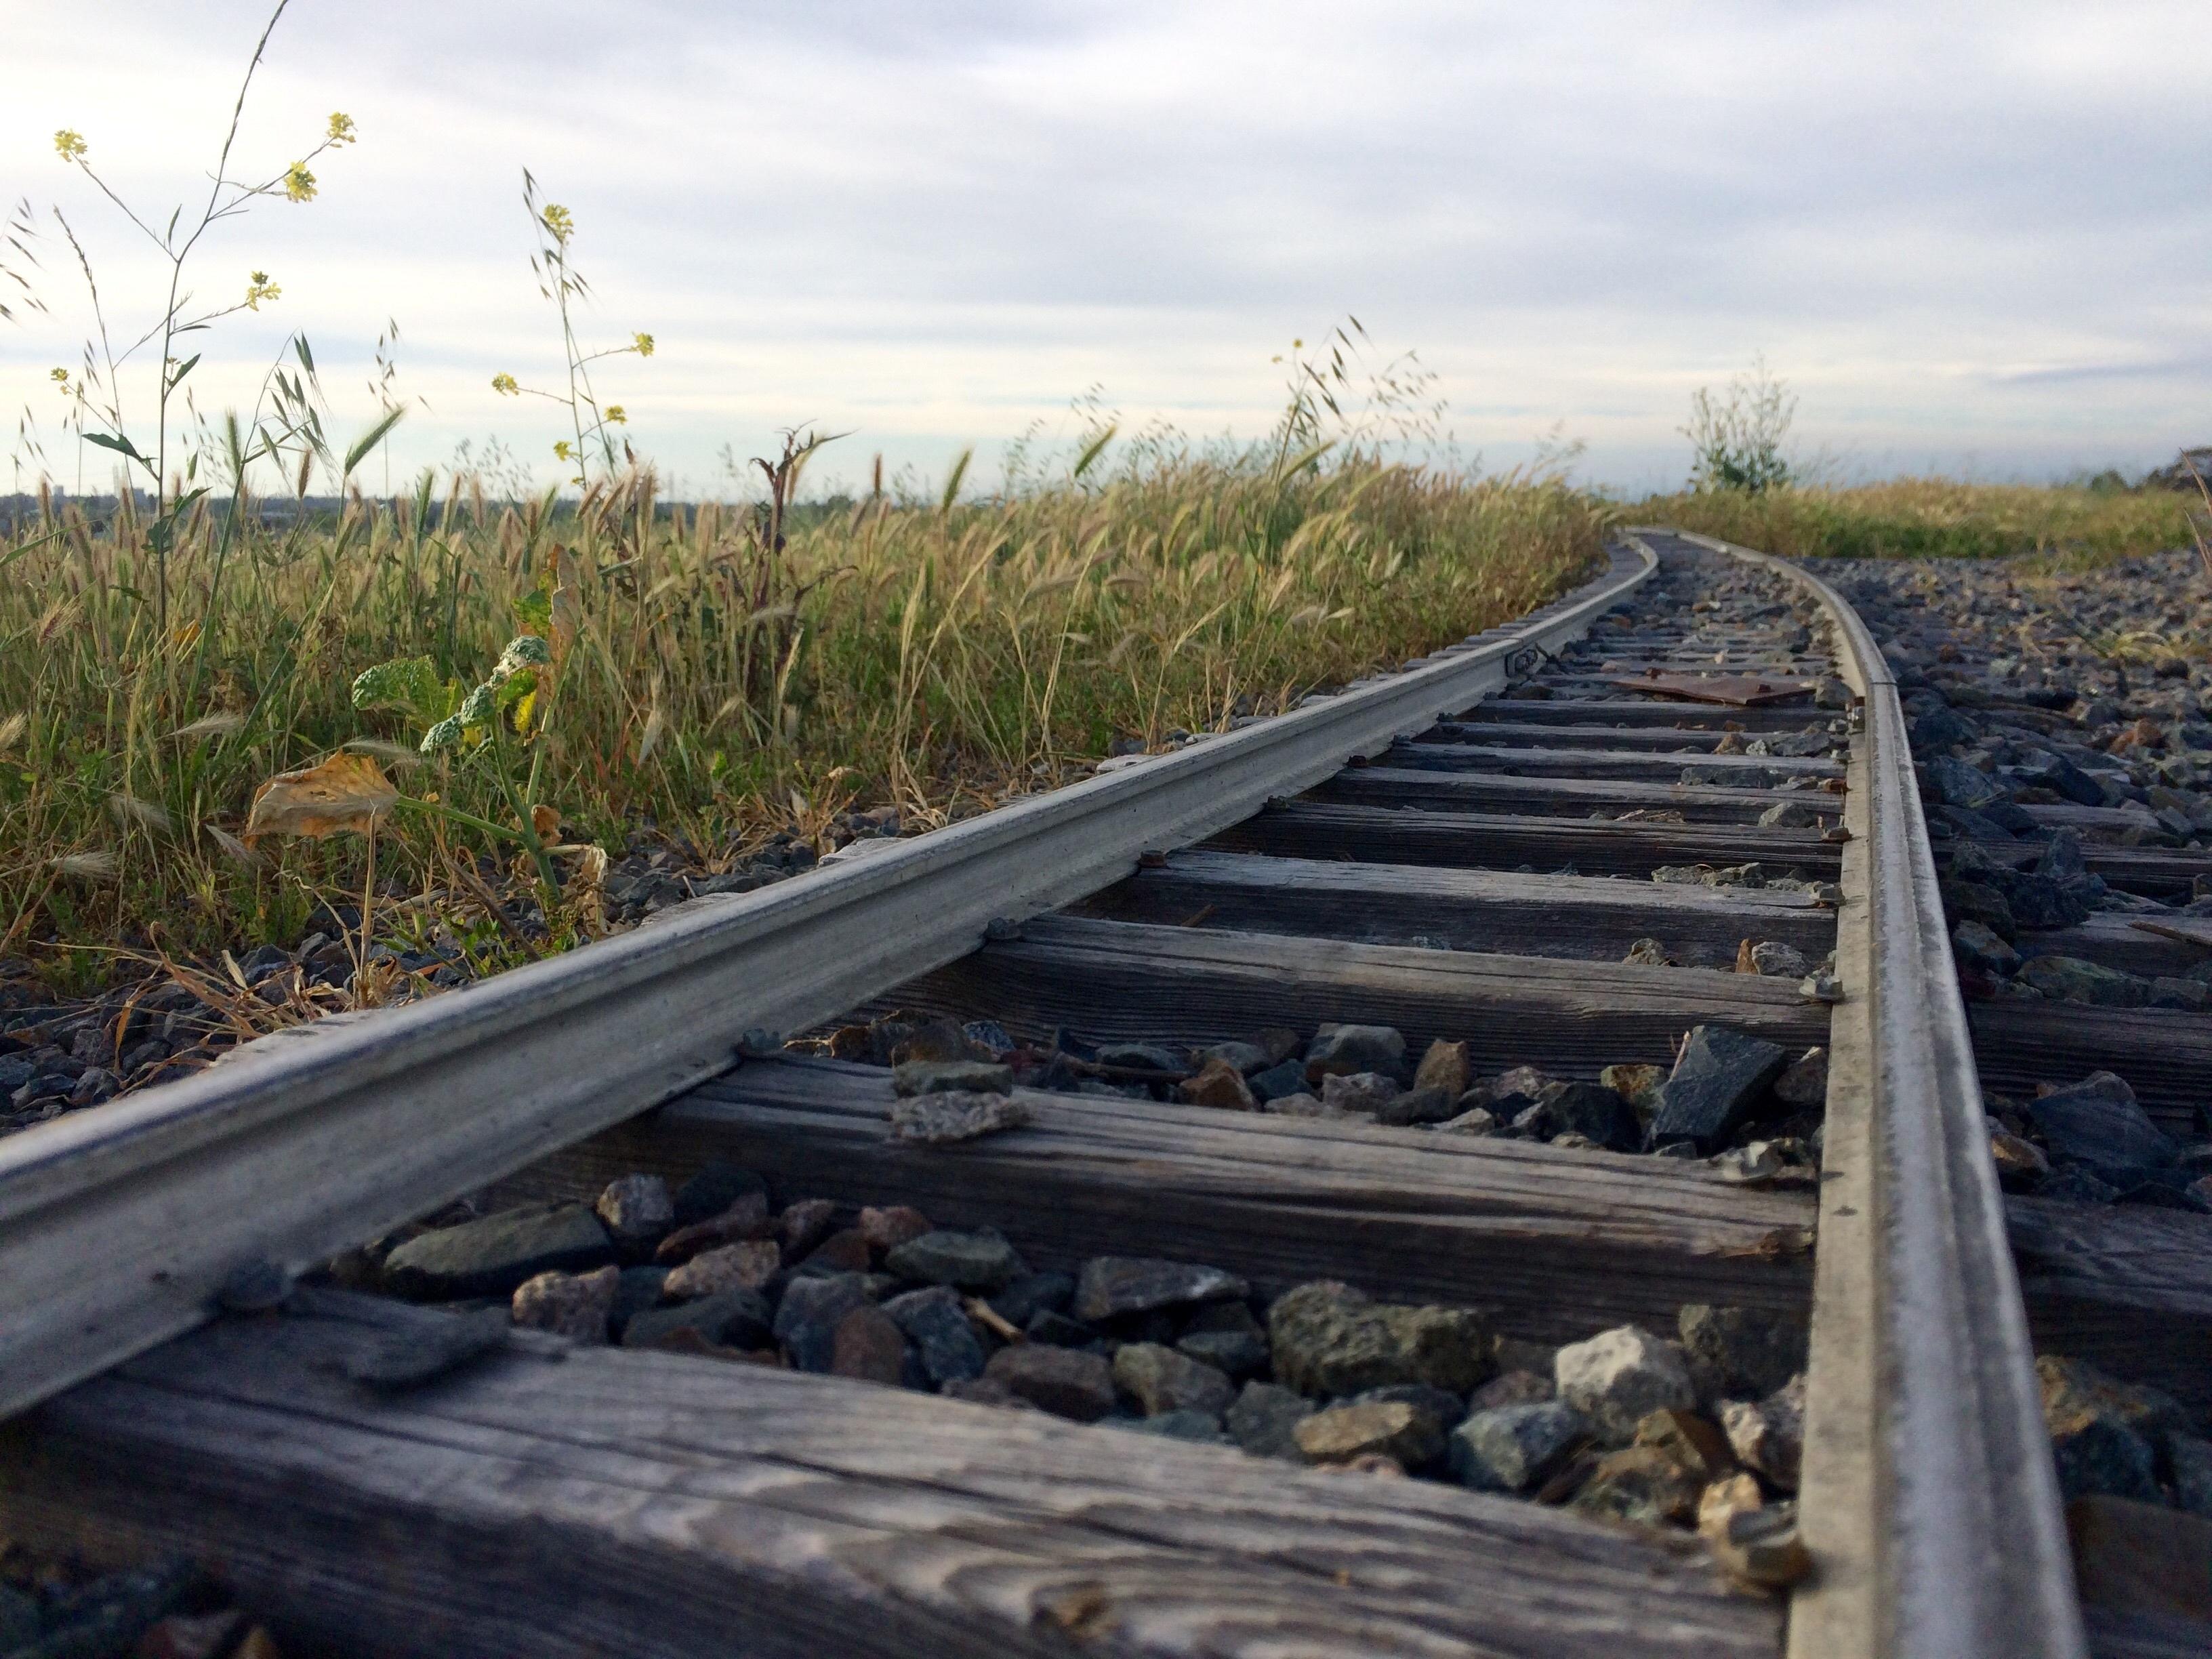 совет железная дорога металл фото передняя